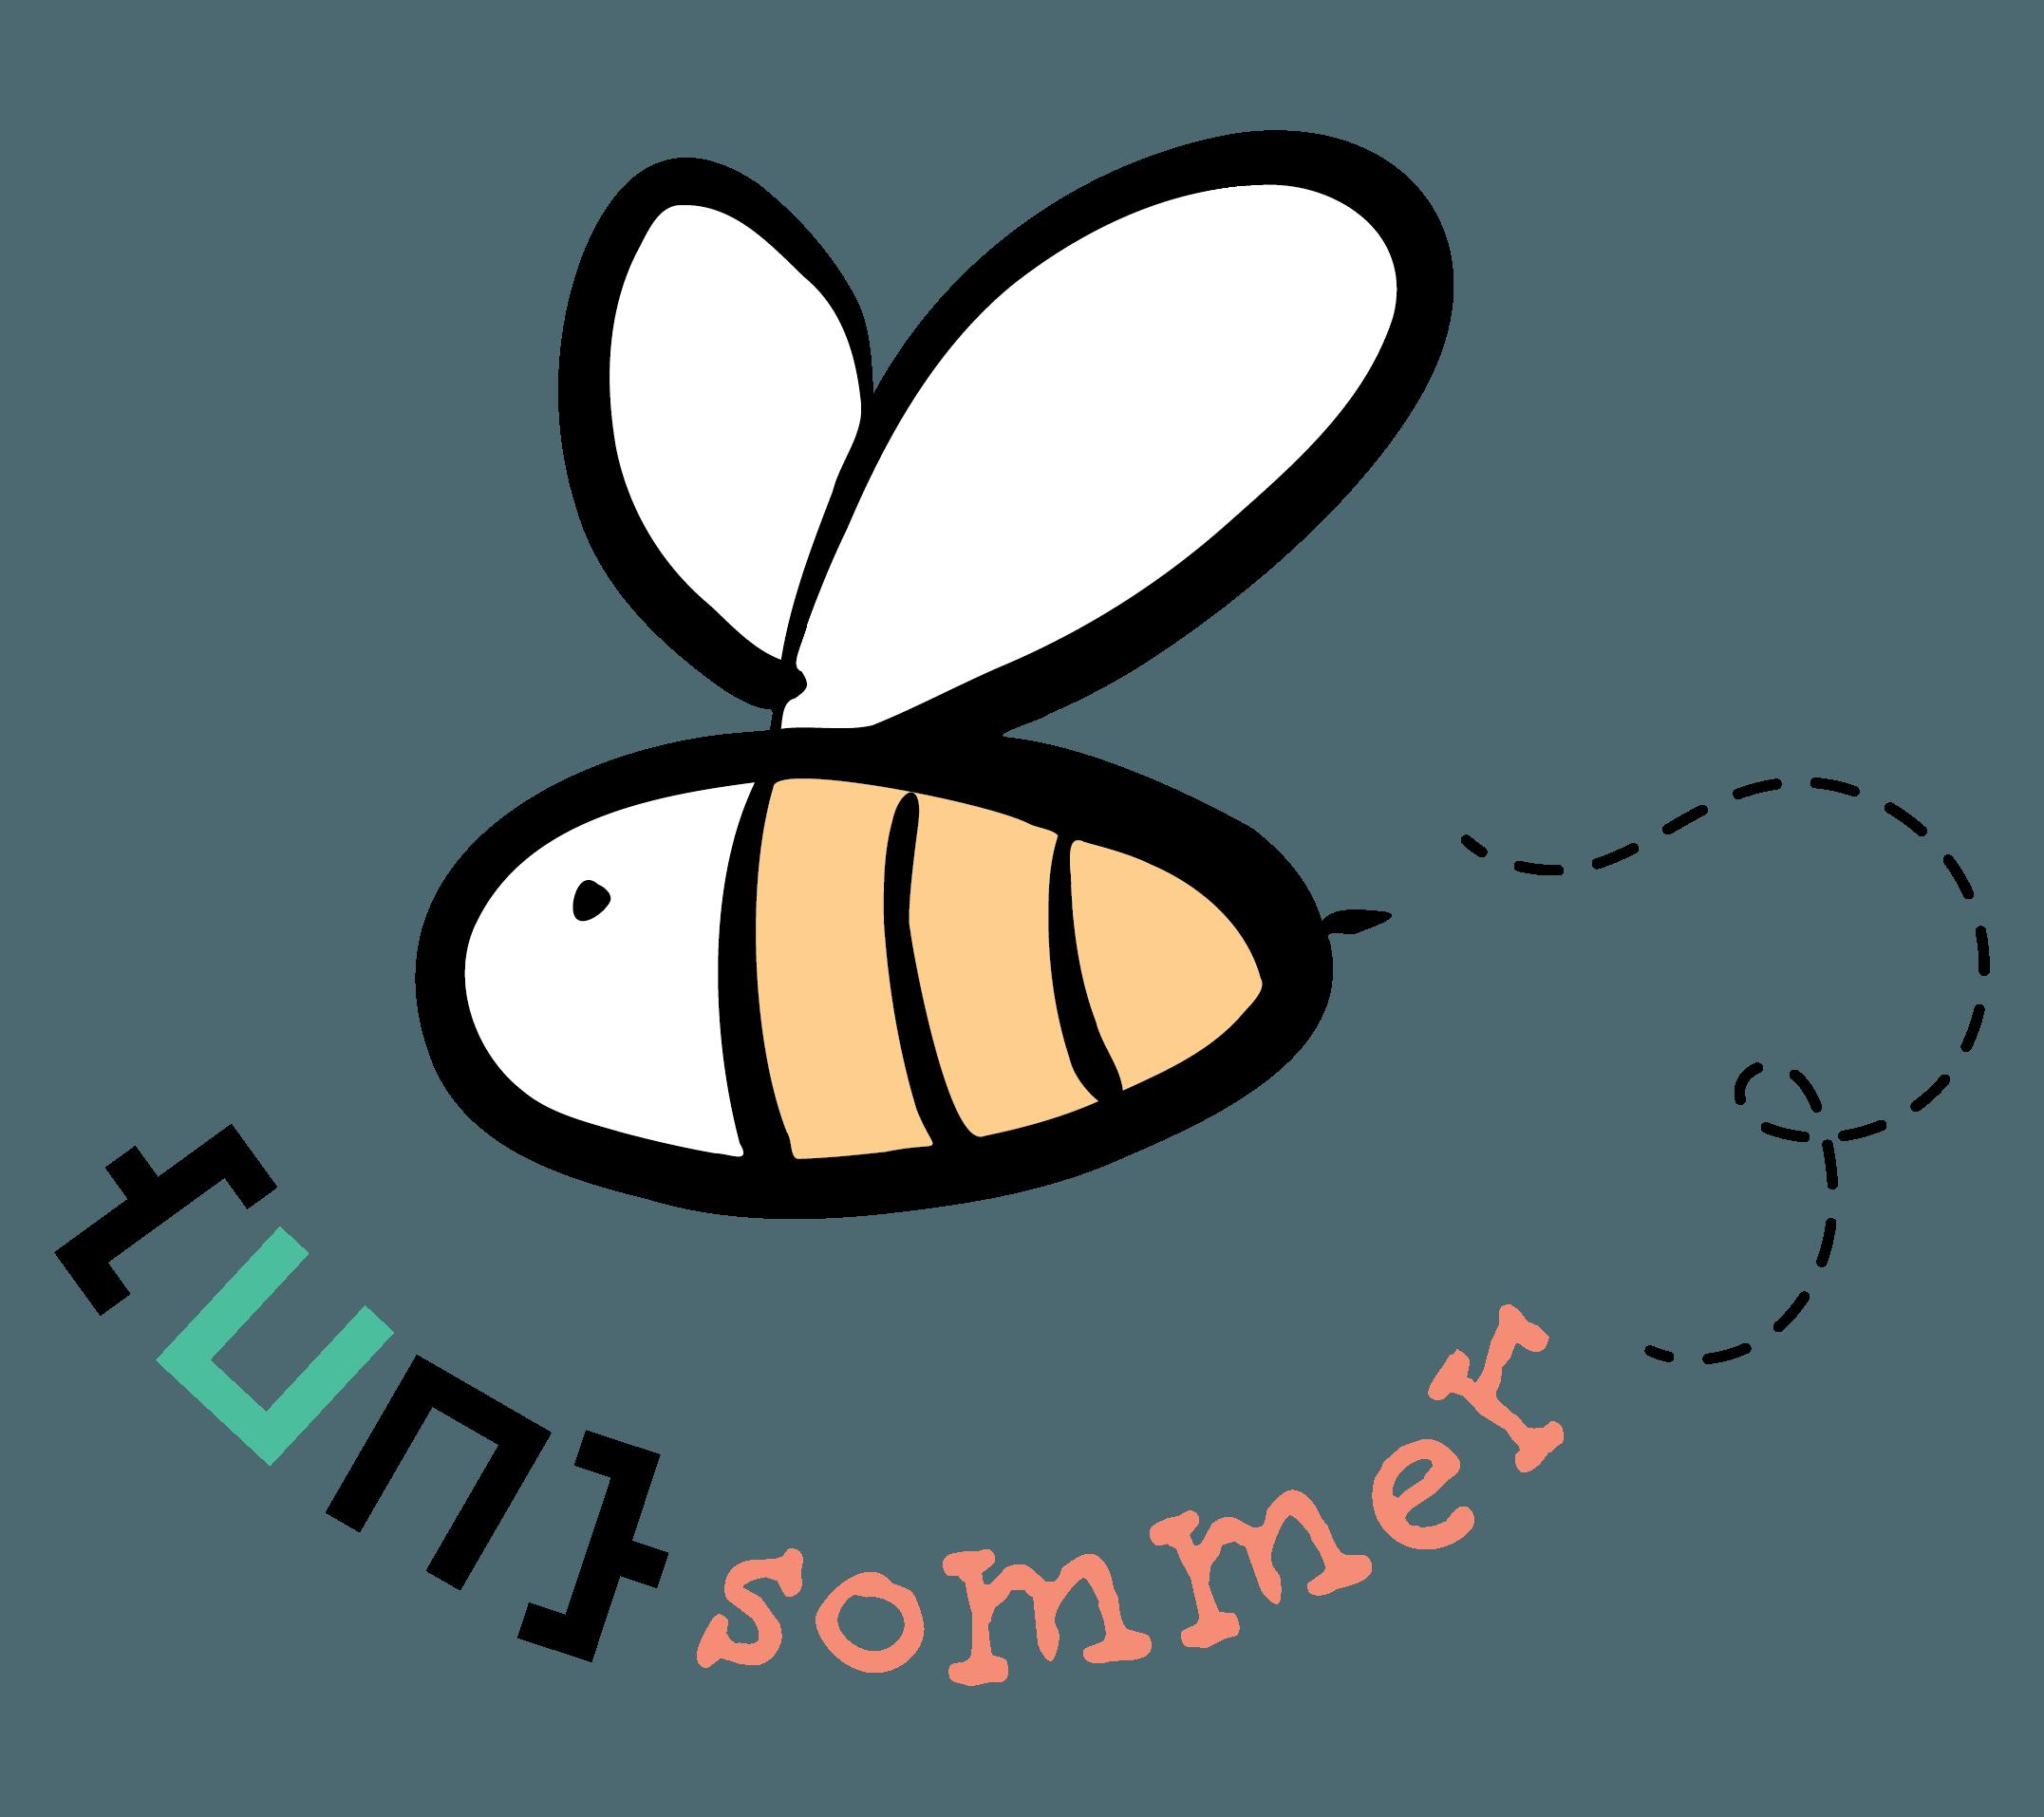 UngNannestad sommerskole - logo